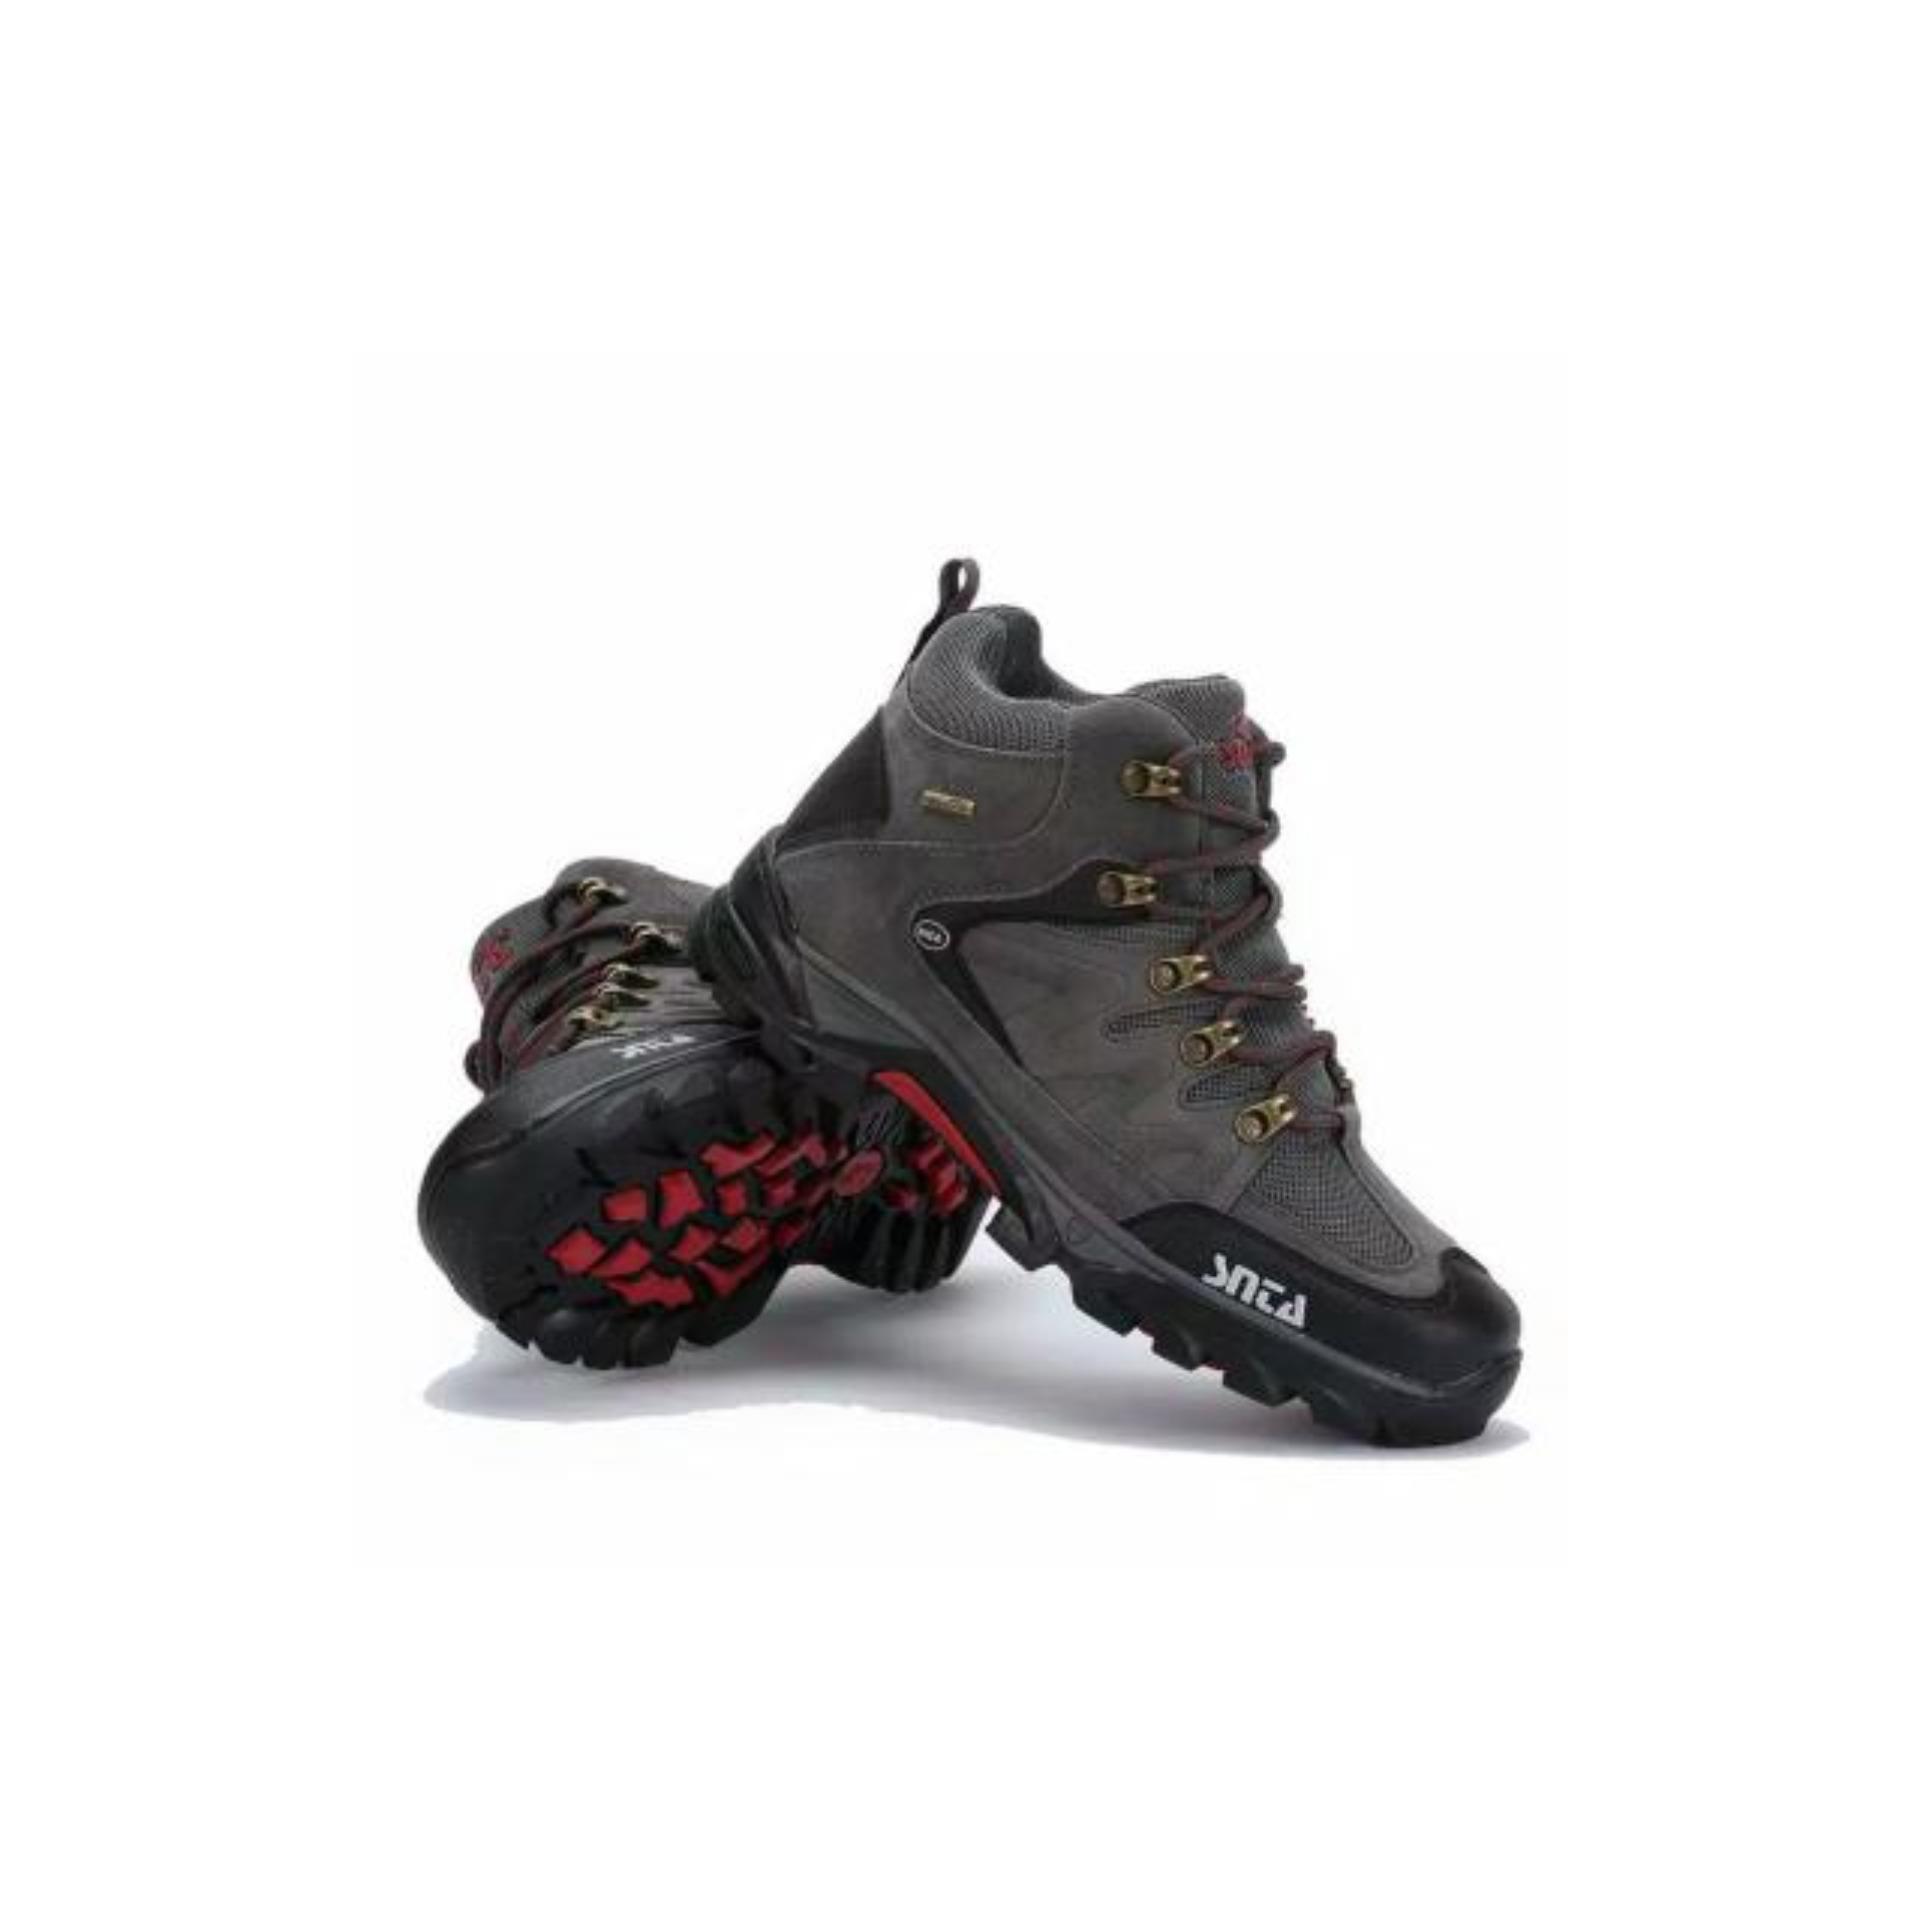 Snta Sepatu Hiking Wanita Outdoor 602 01 Series Cokelat Gunung 471 Trekking